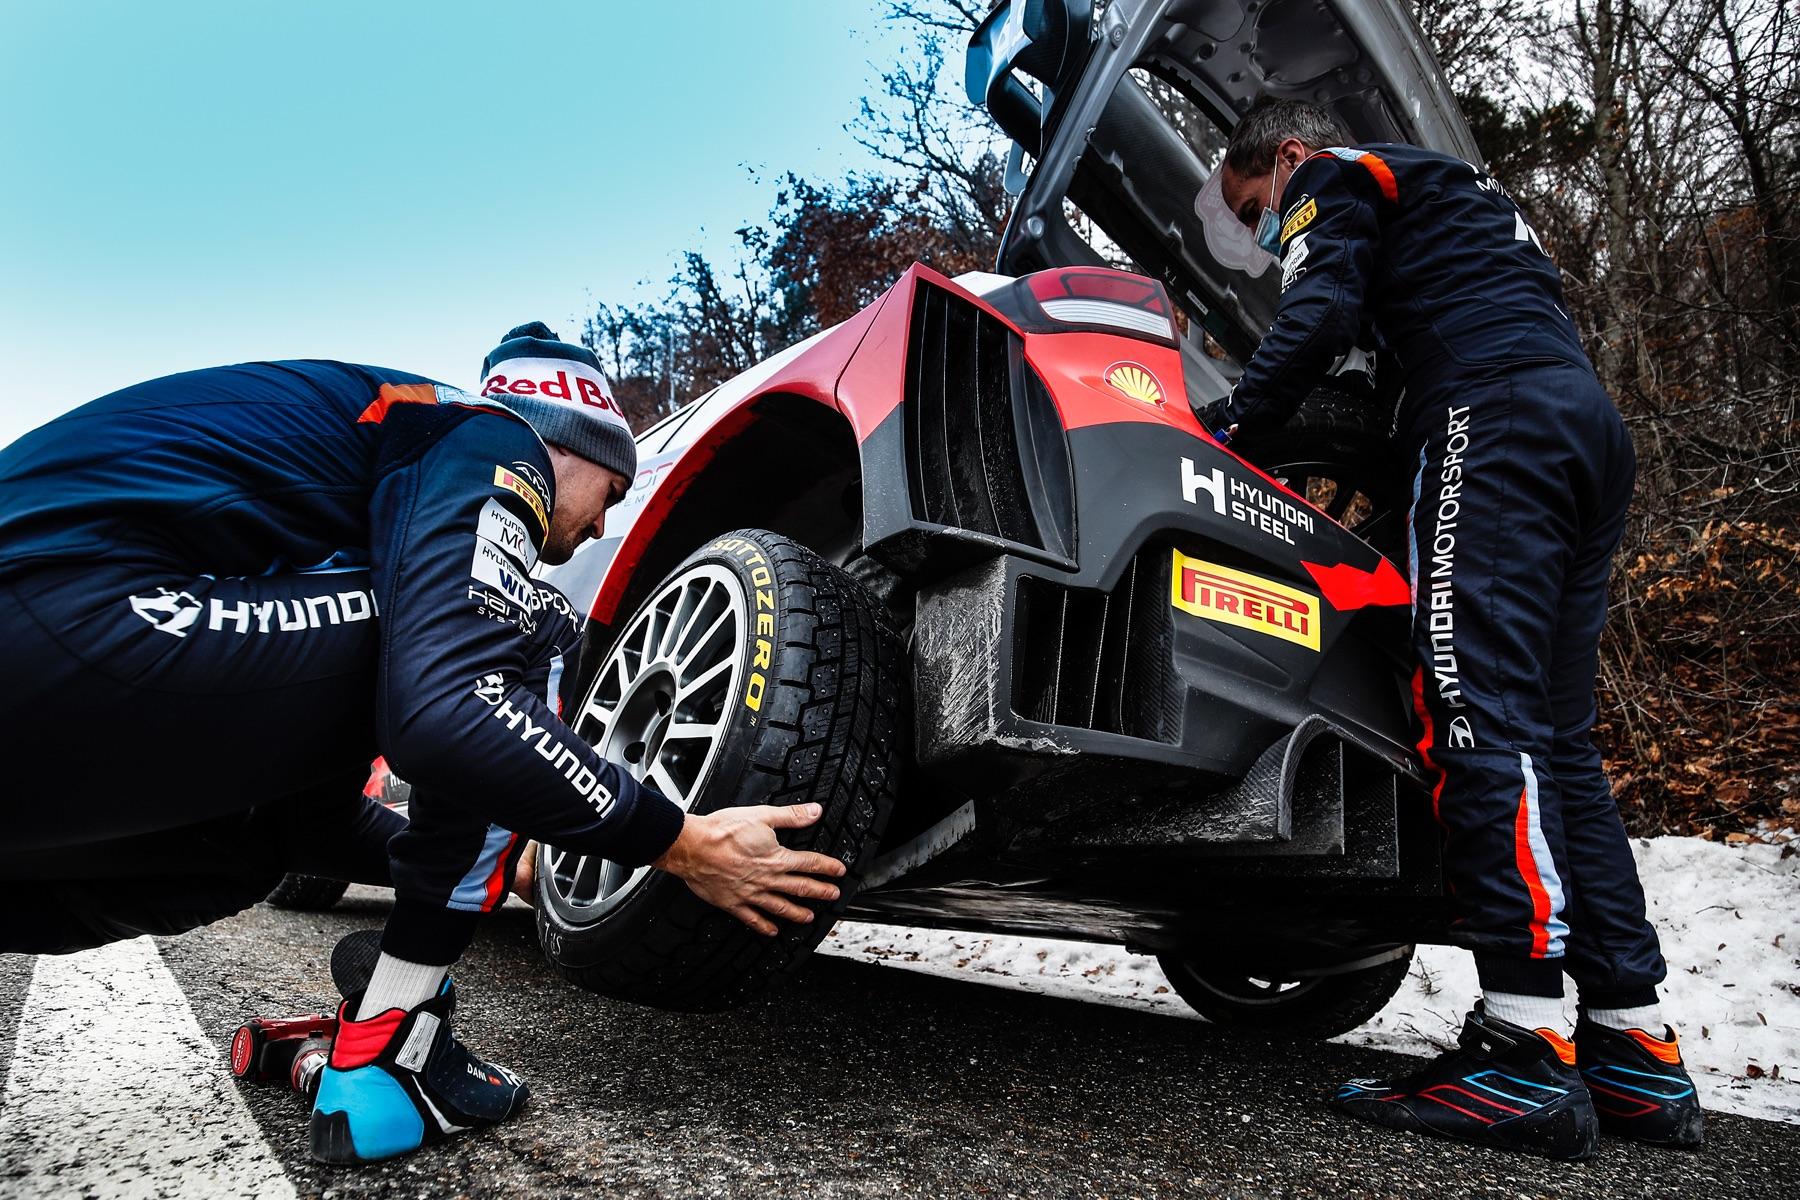 WRC: 89º Rallye Automobile de Monte-Carlo [18-24 Enero] - Página 15 EsfTKW1XEAAIHPU?format=jpg&name=large